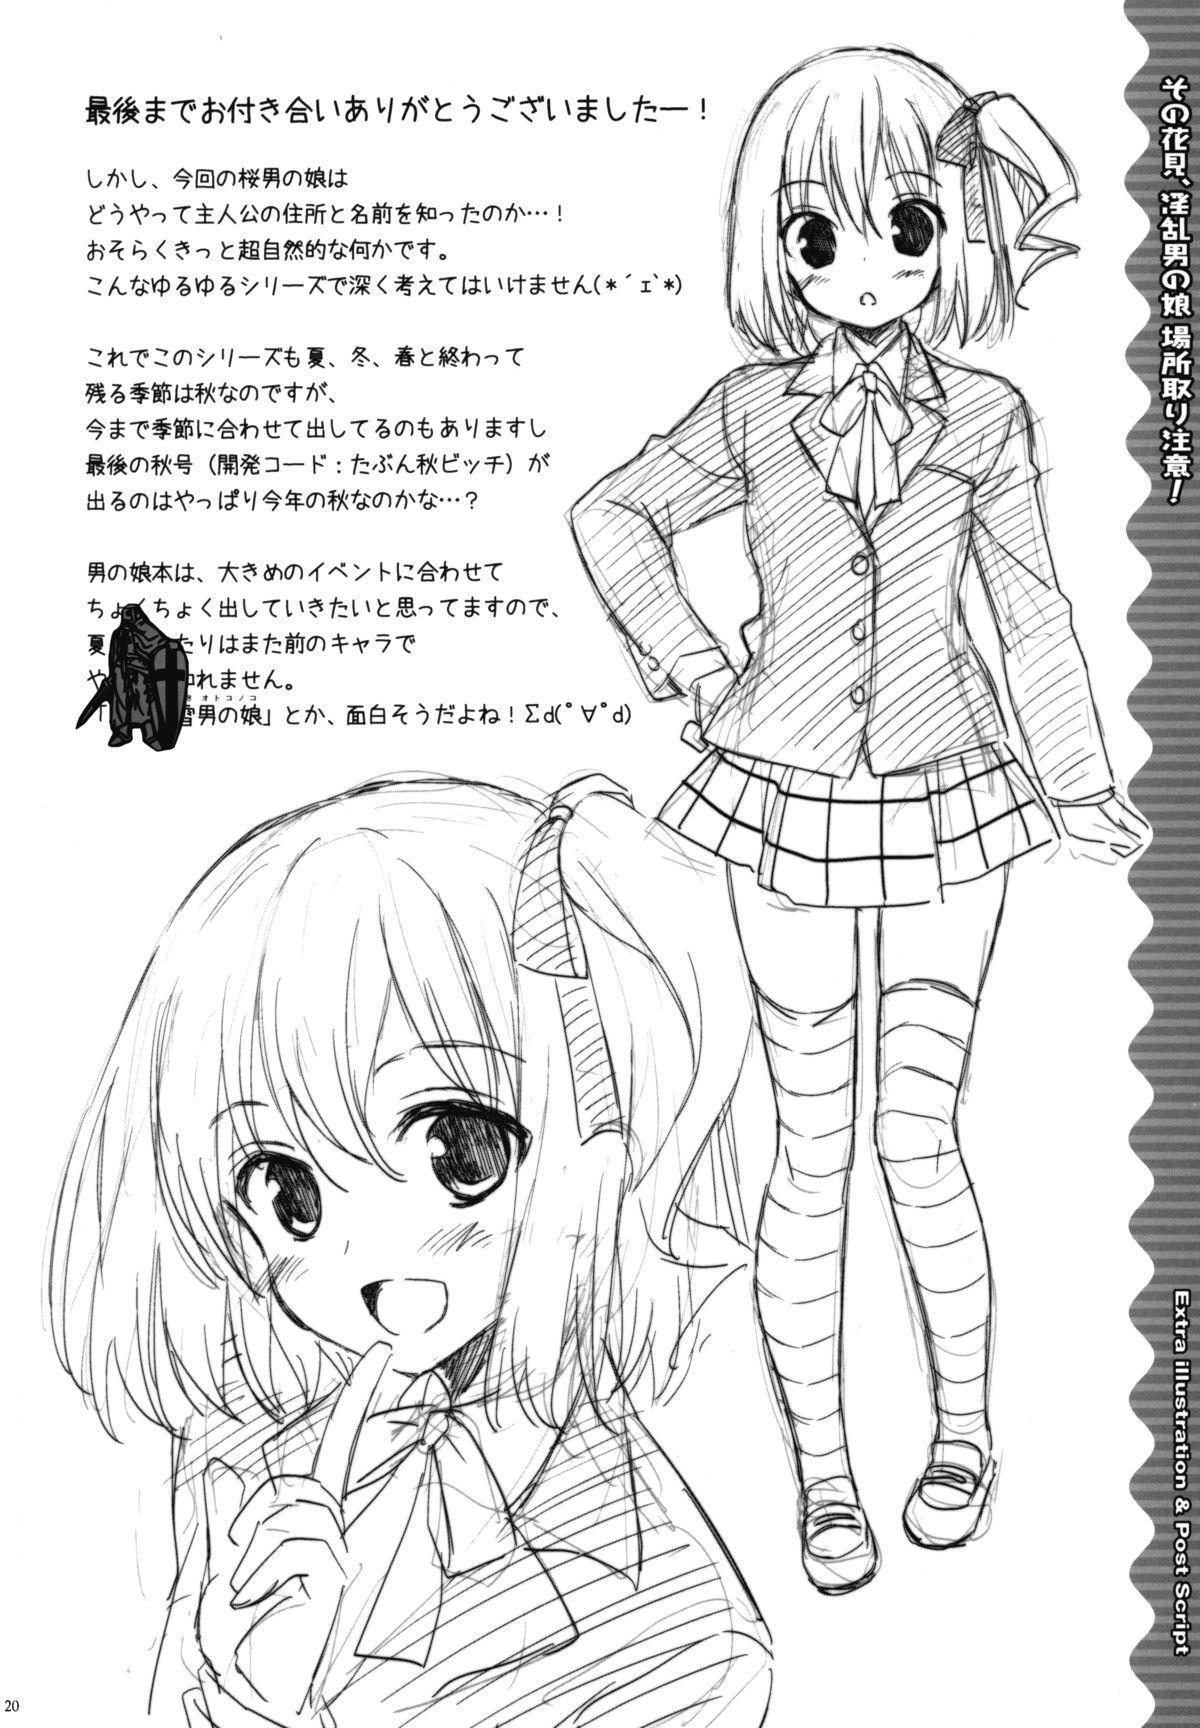 Sono Hanami, Inran Otokonoko Basho Tori Chuui | Beware of slutty traps while claiming places for cherry blossom viewing! 18